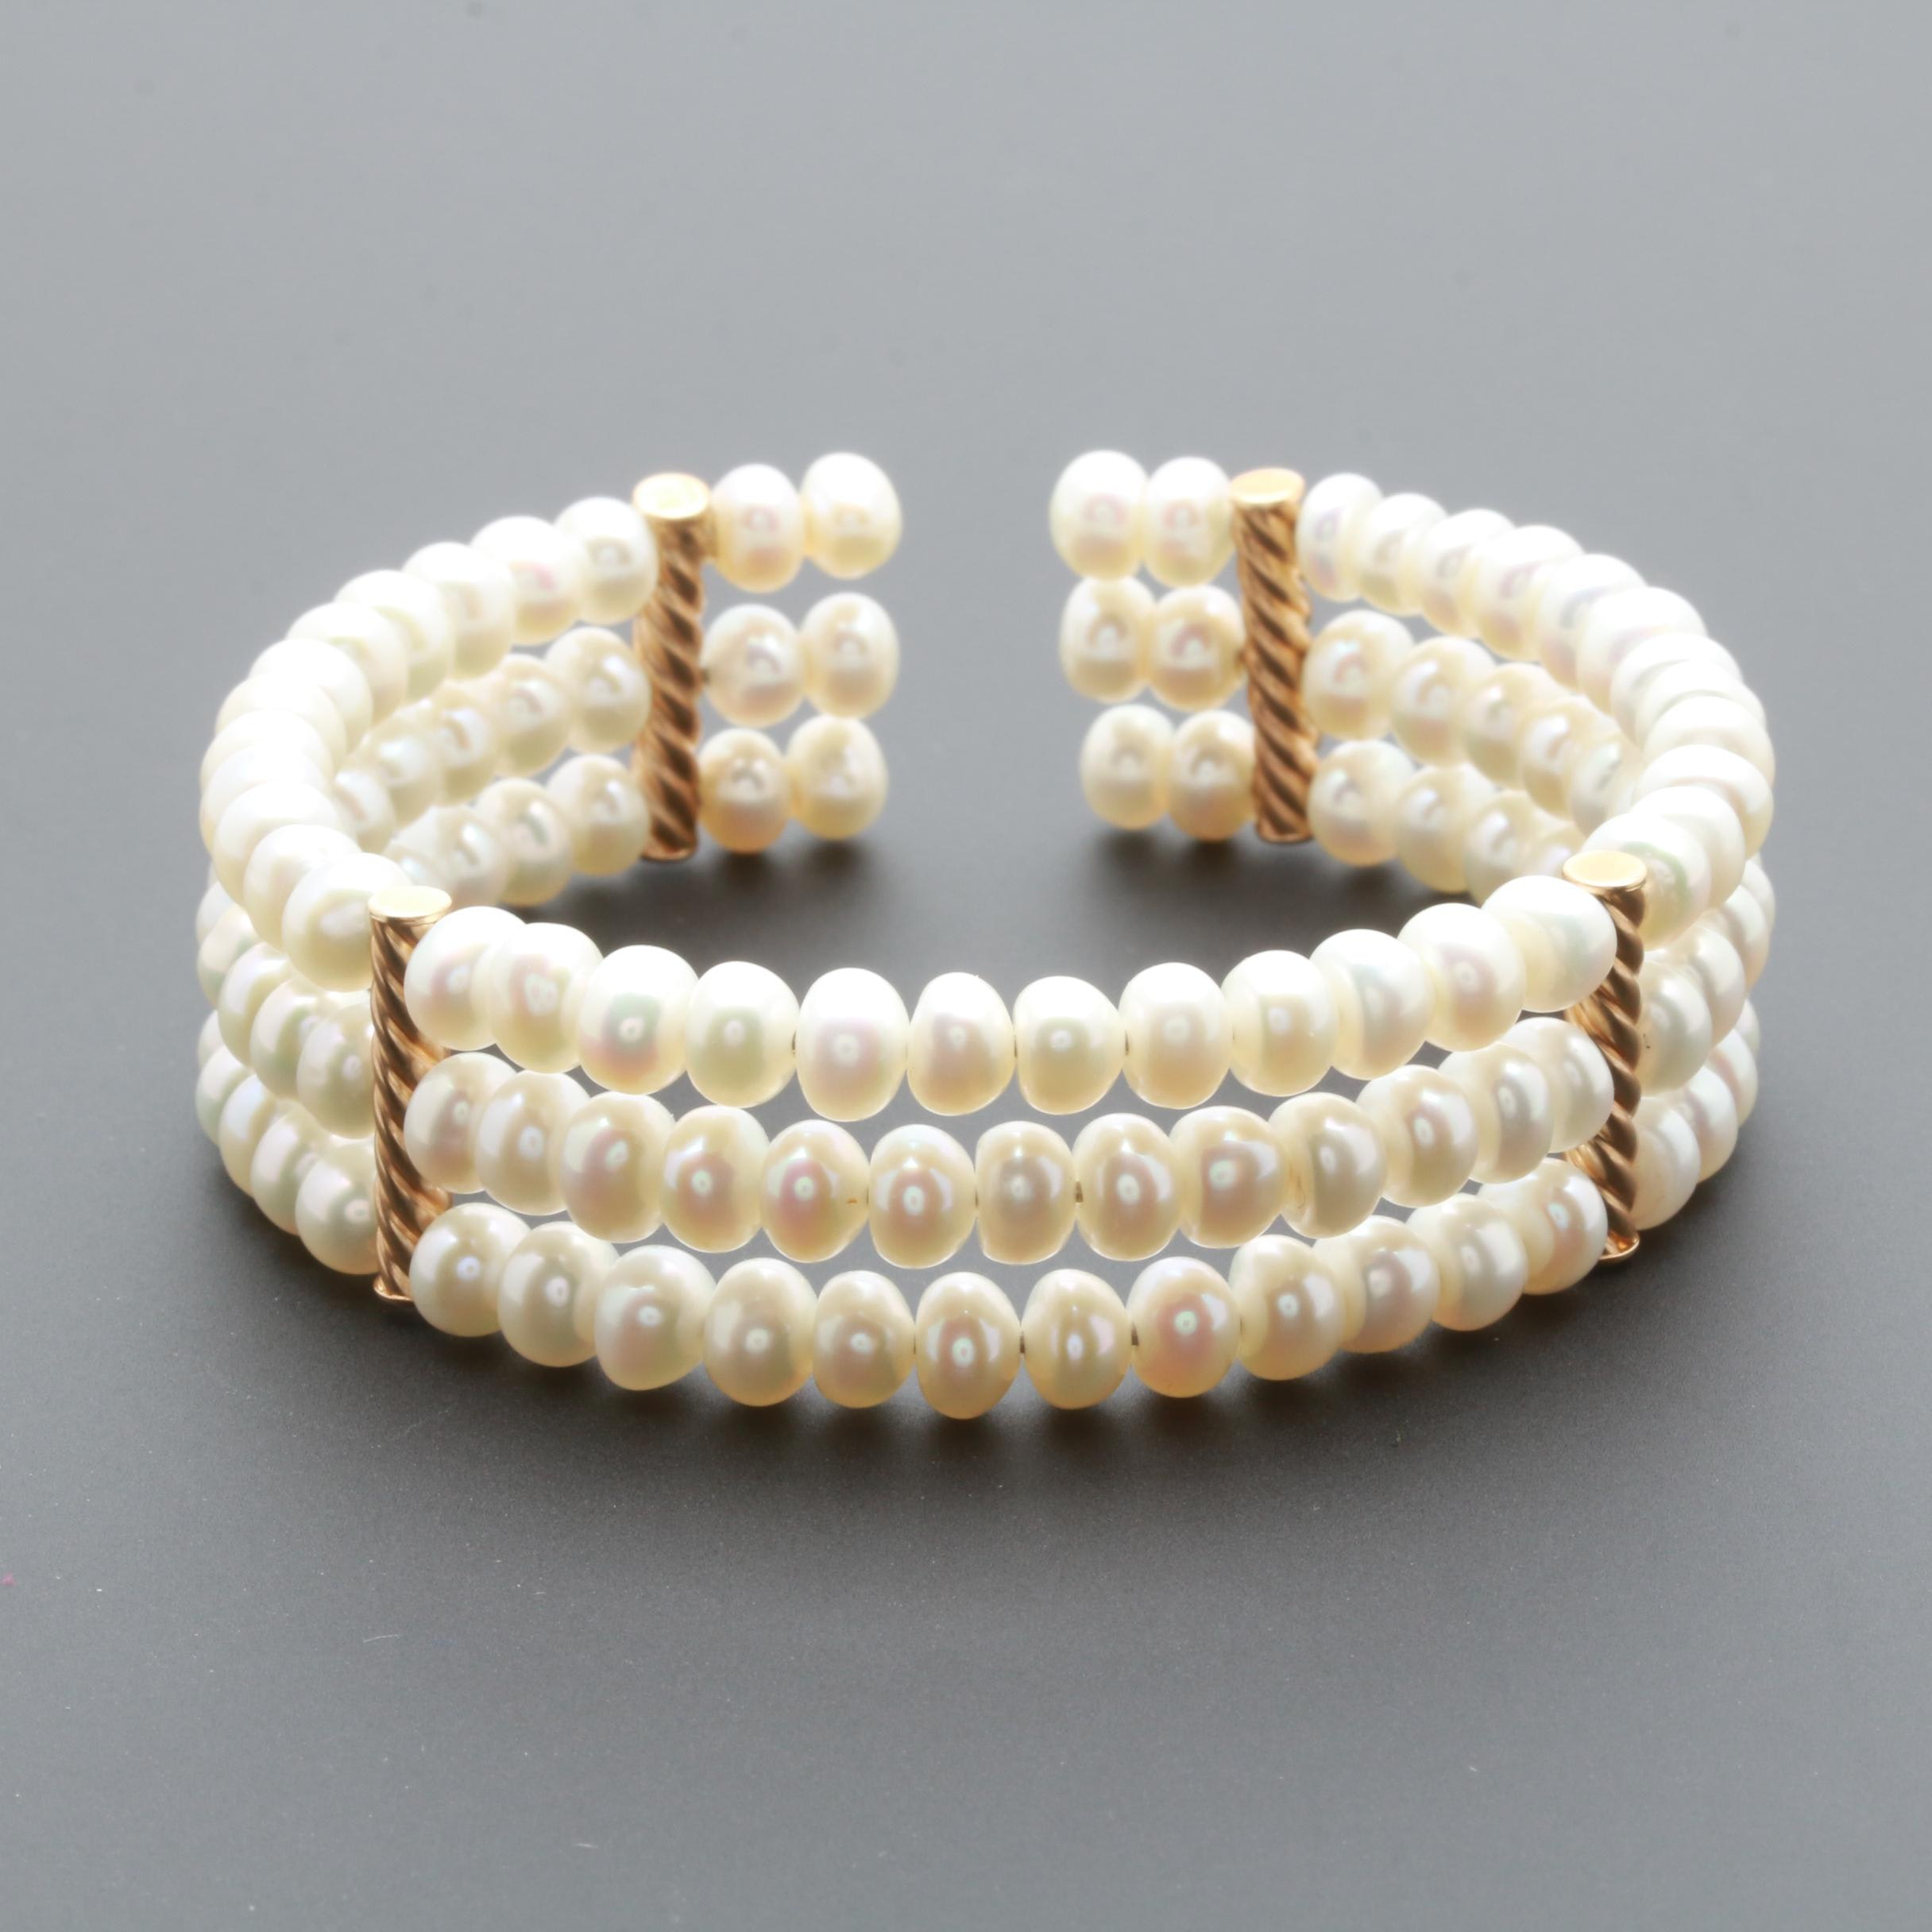 14K Yellow Gold Cultured Pearl Cuff Bracelet